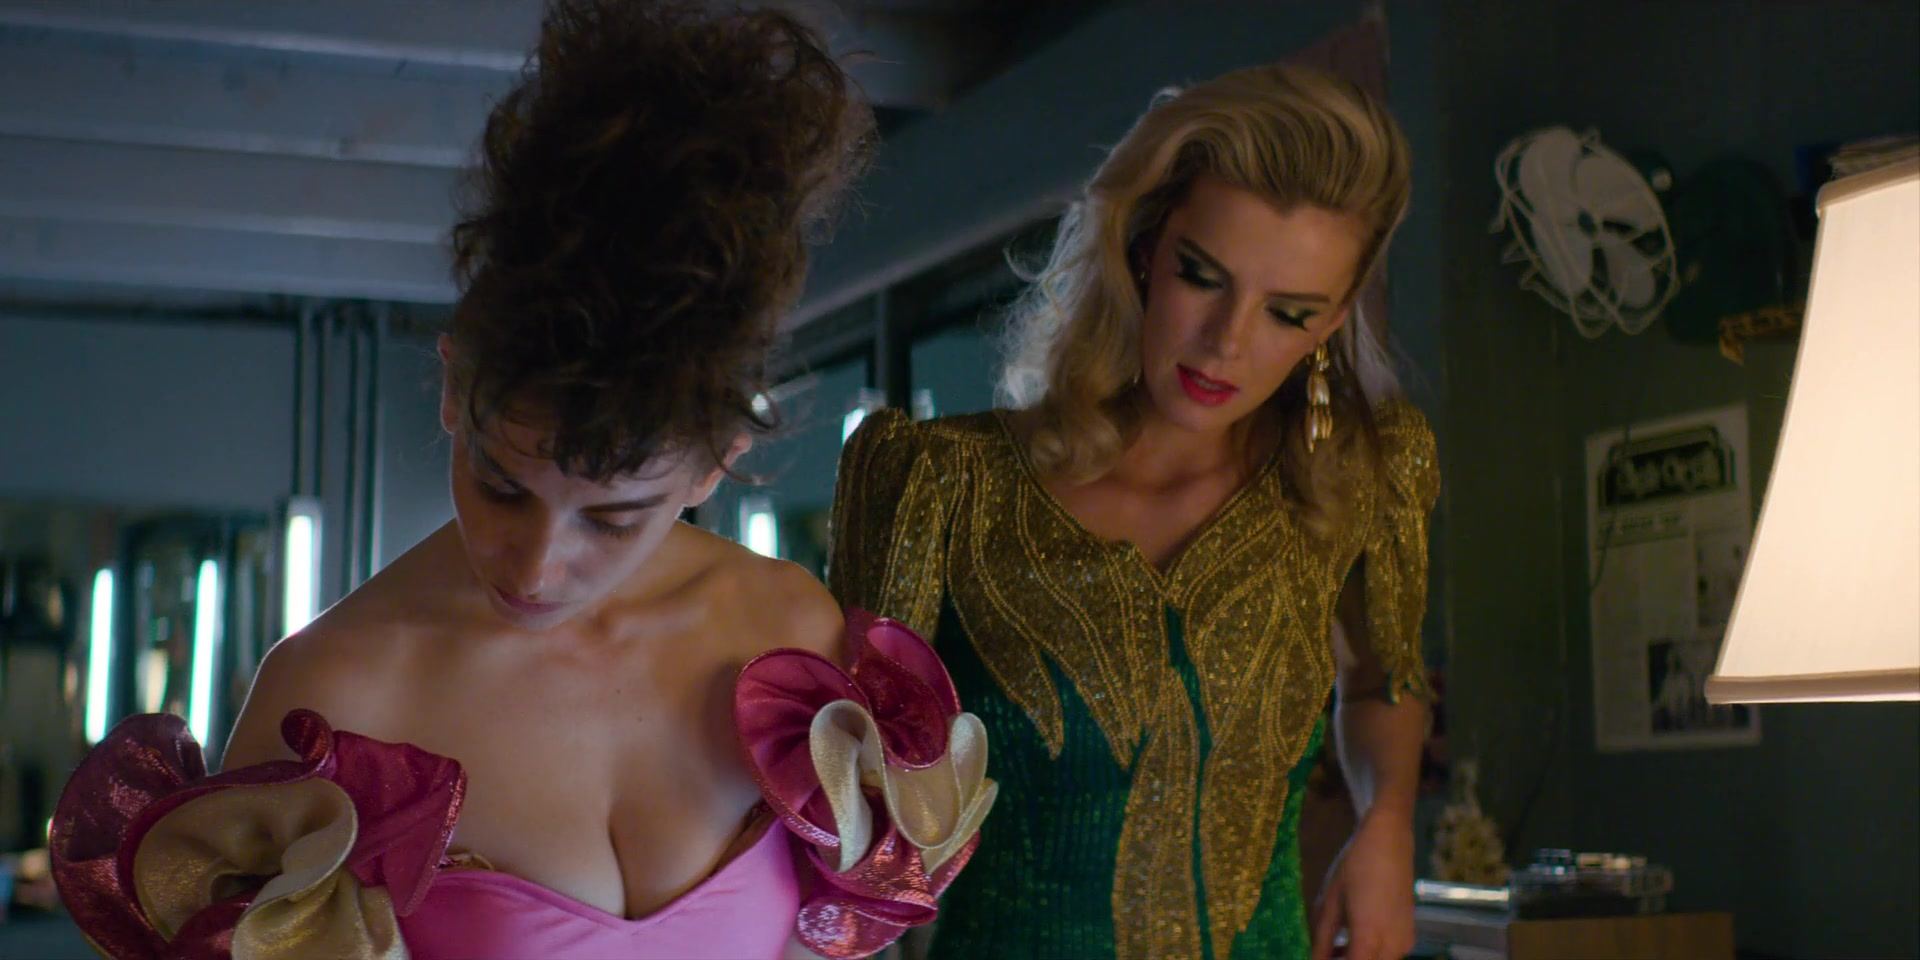 Alison Brie Nuda alison brie, kate nash nude - glow s03e08-10 (2019) » nude